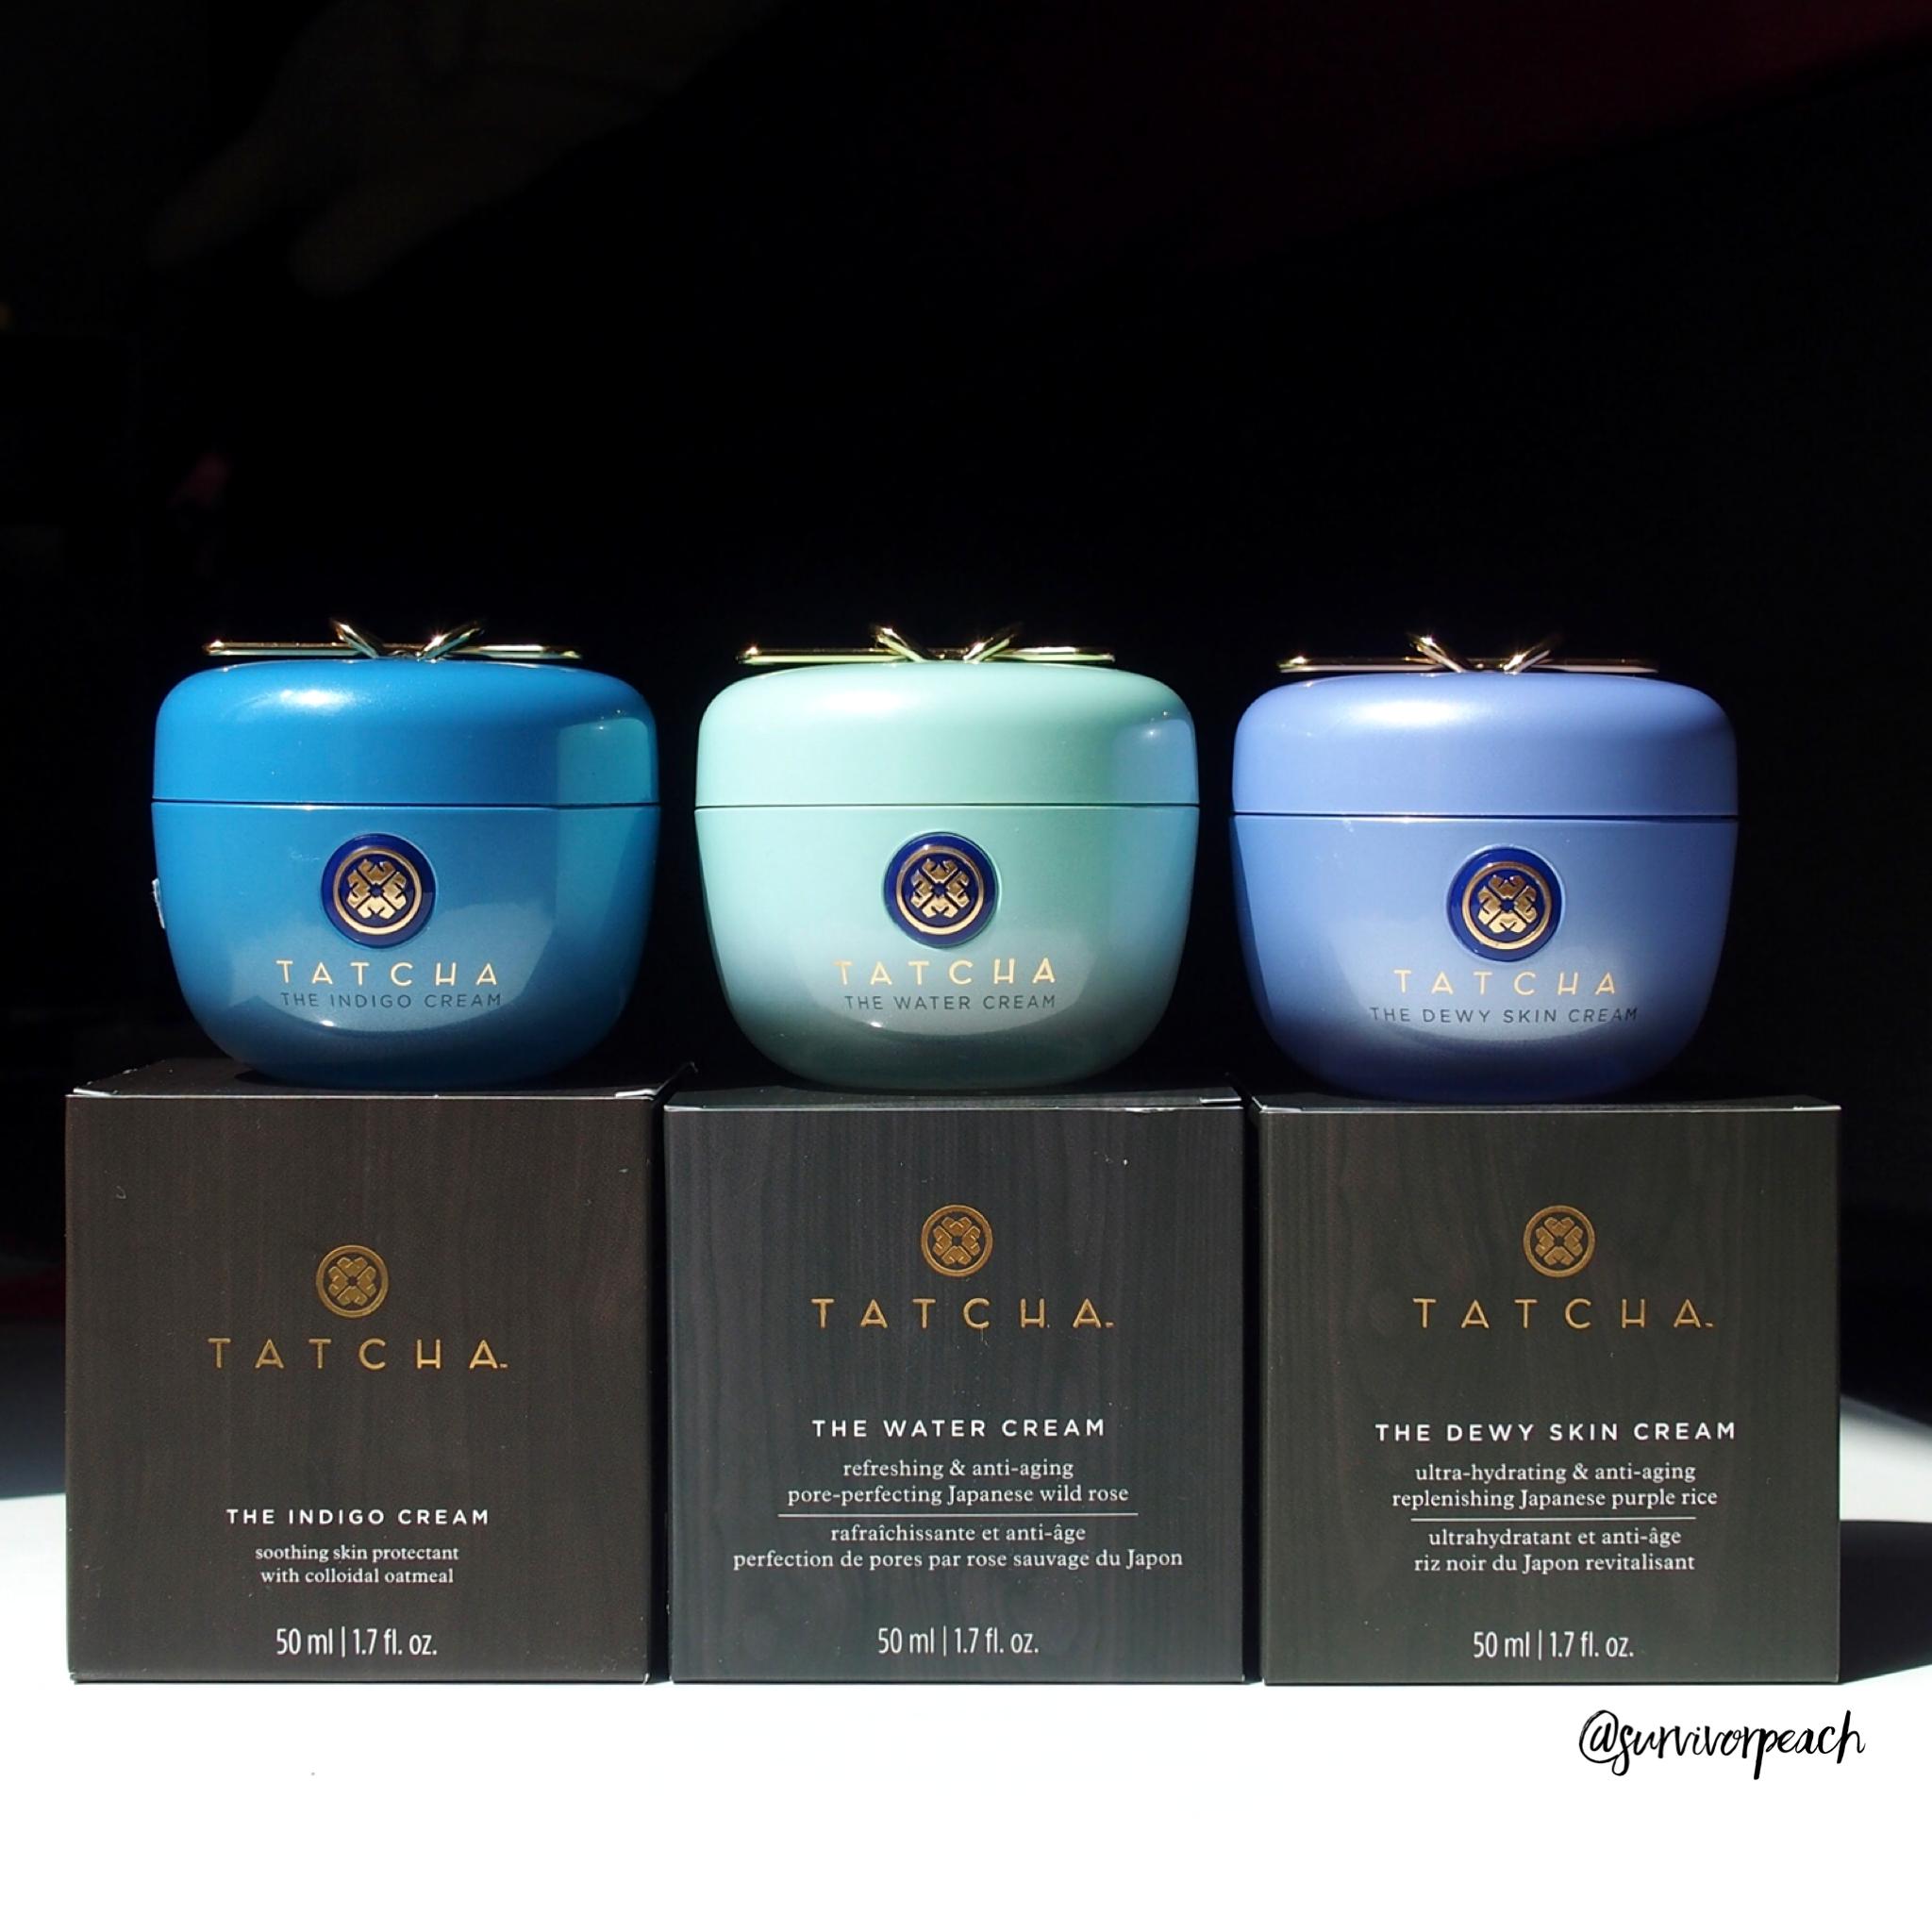 Tatcha Creams : The Indigo Cream, The Water Cream, the Dewy Skin Cream